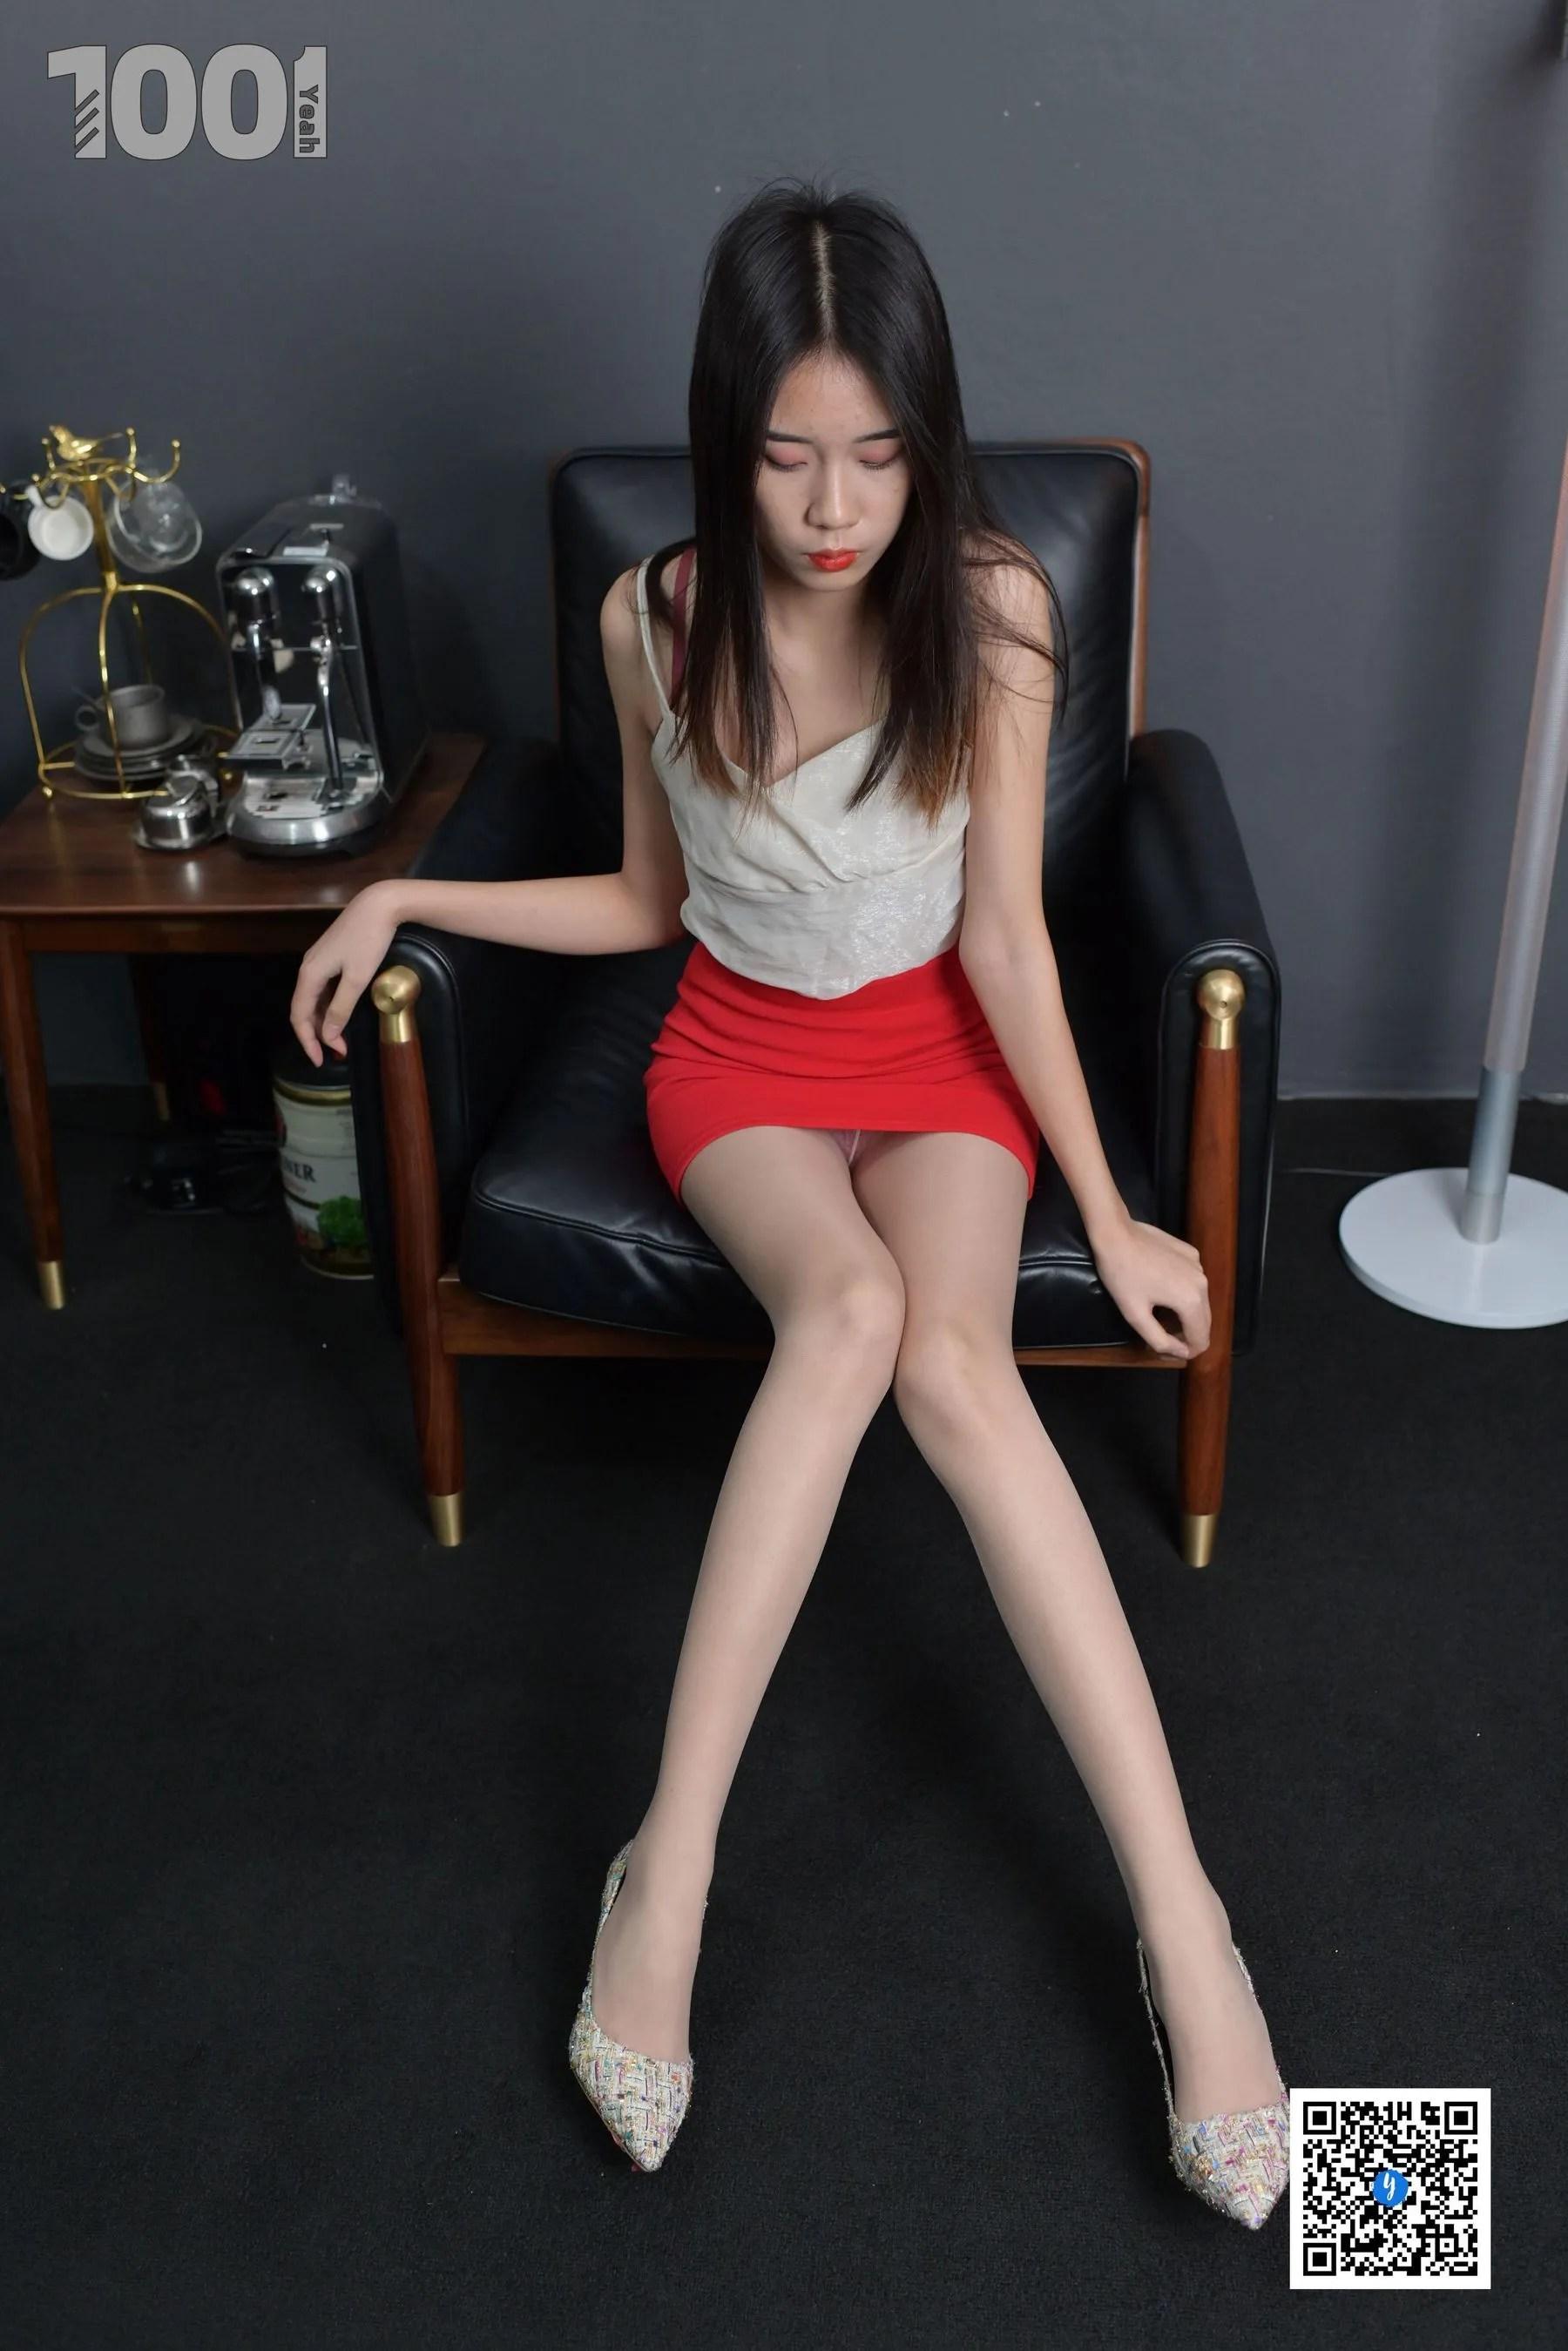 [IESS] NO.187 【一抹红】  丝袜美腿写真[87P]插图(3)